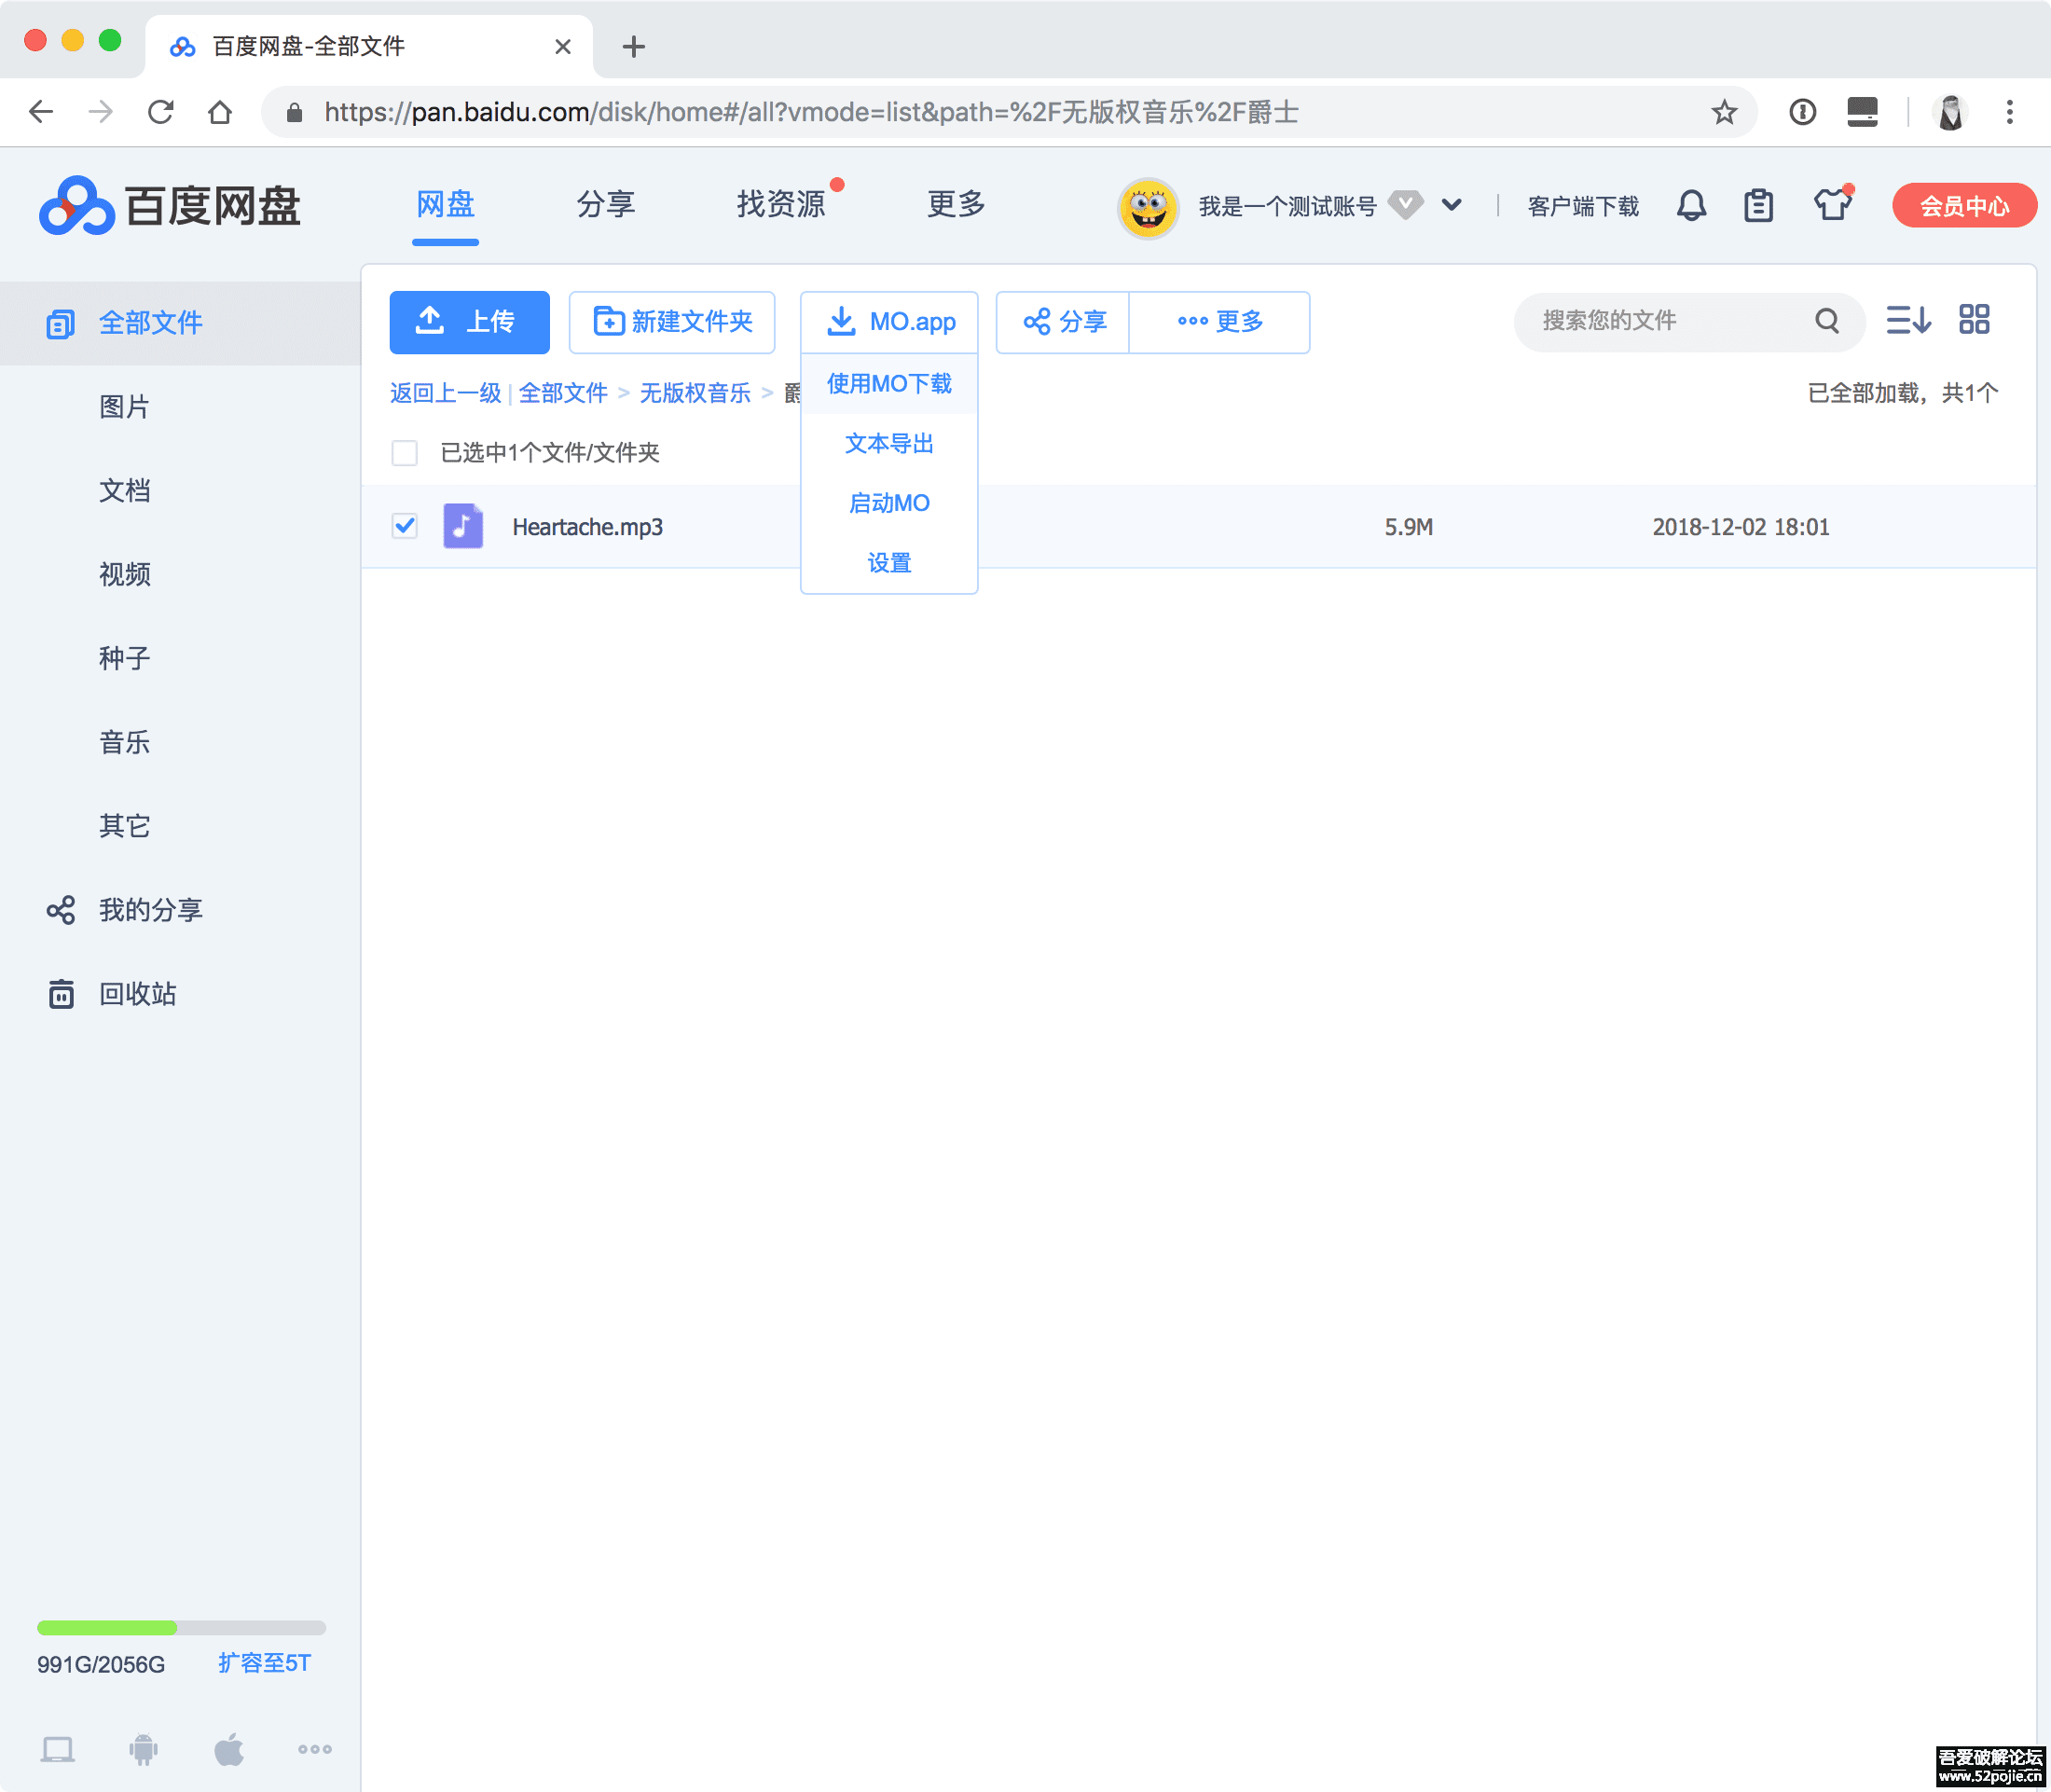 【windows】Motrix v1.4.1,又一款强大的下载工具,支持百度网盘满速! 电脑软件 第5张